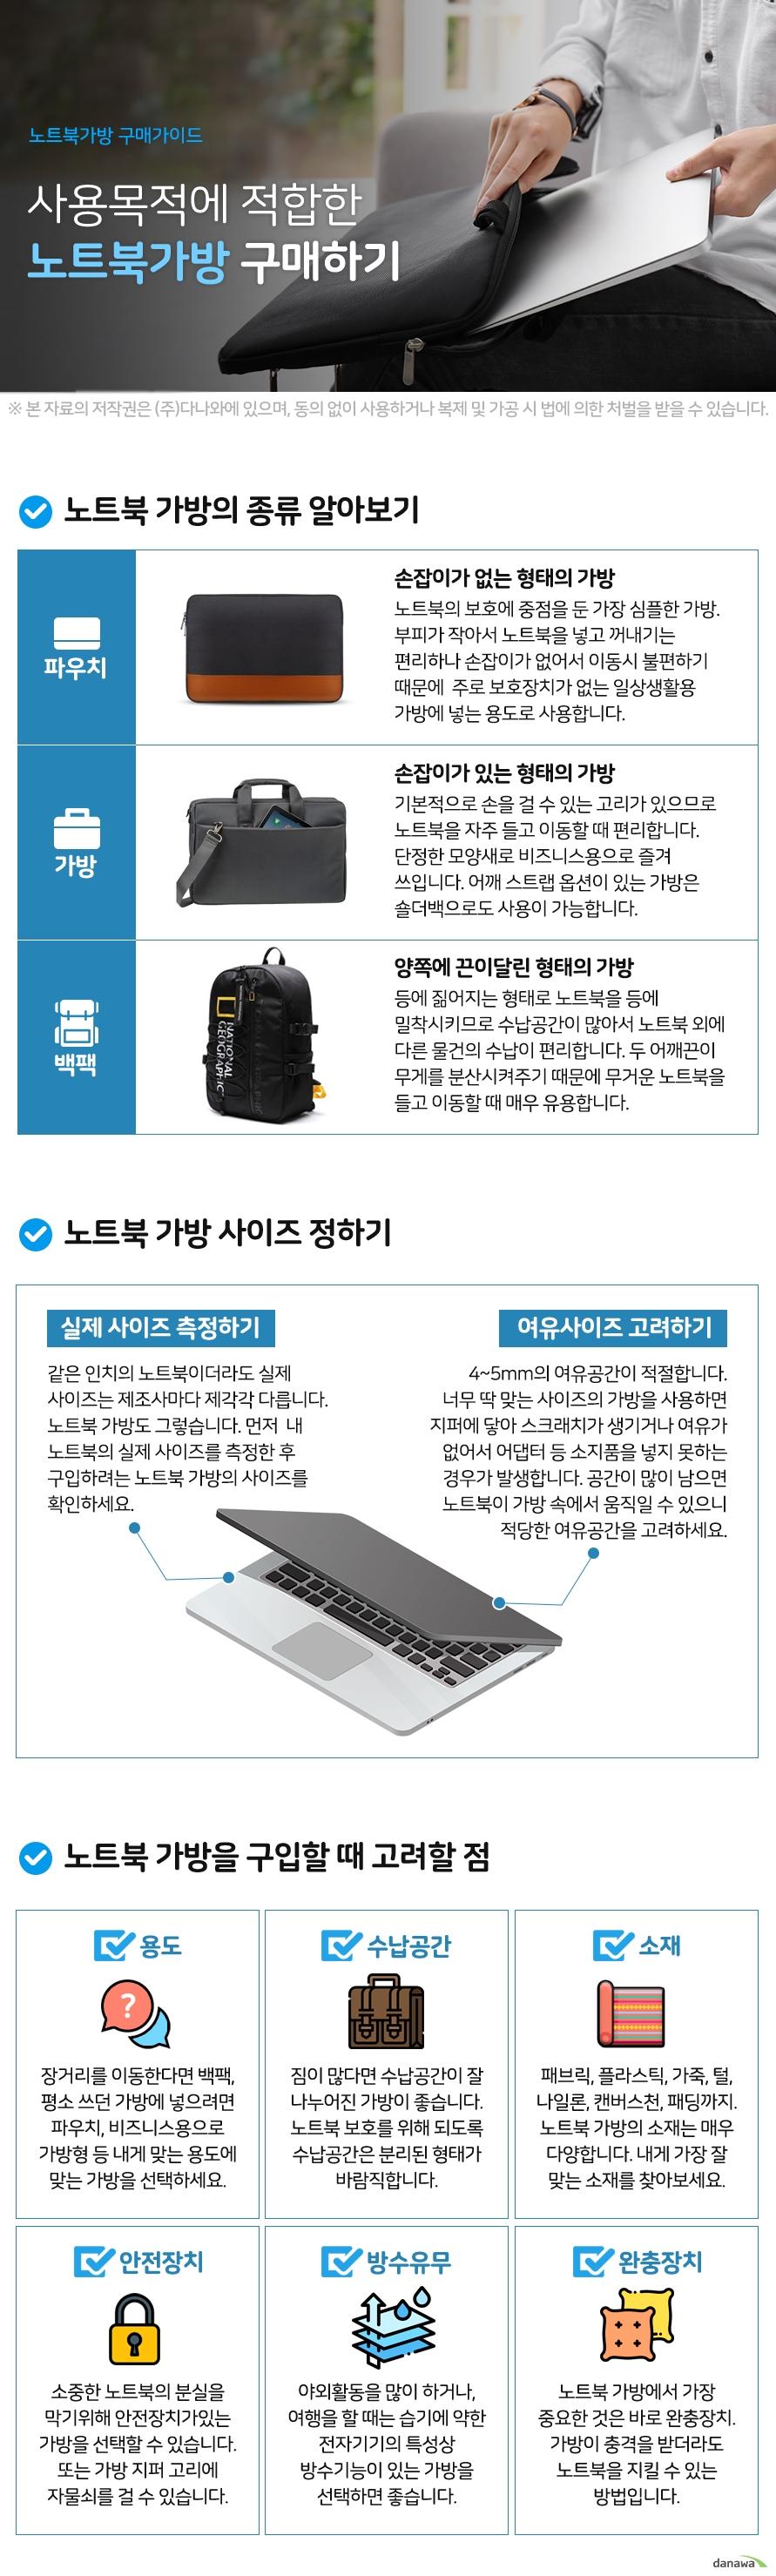 DAMONCOM DAMONCOM 노트북 맥북 파우치 15.6형 NT-395 (다크그레이)